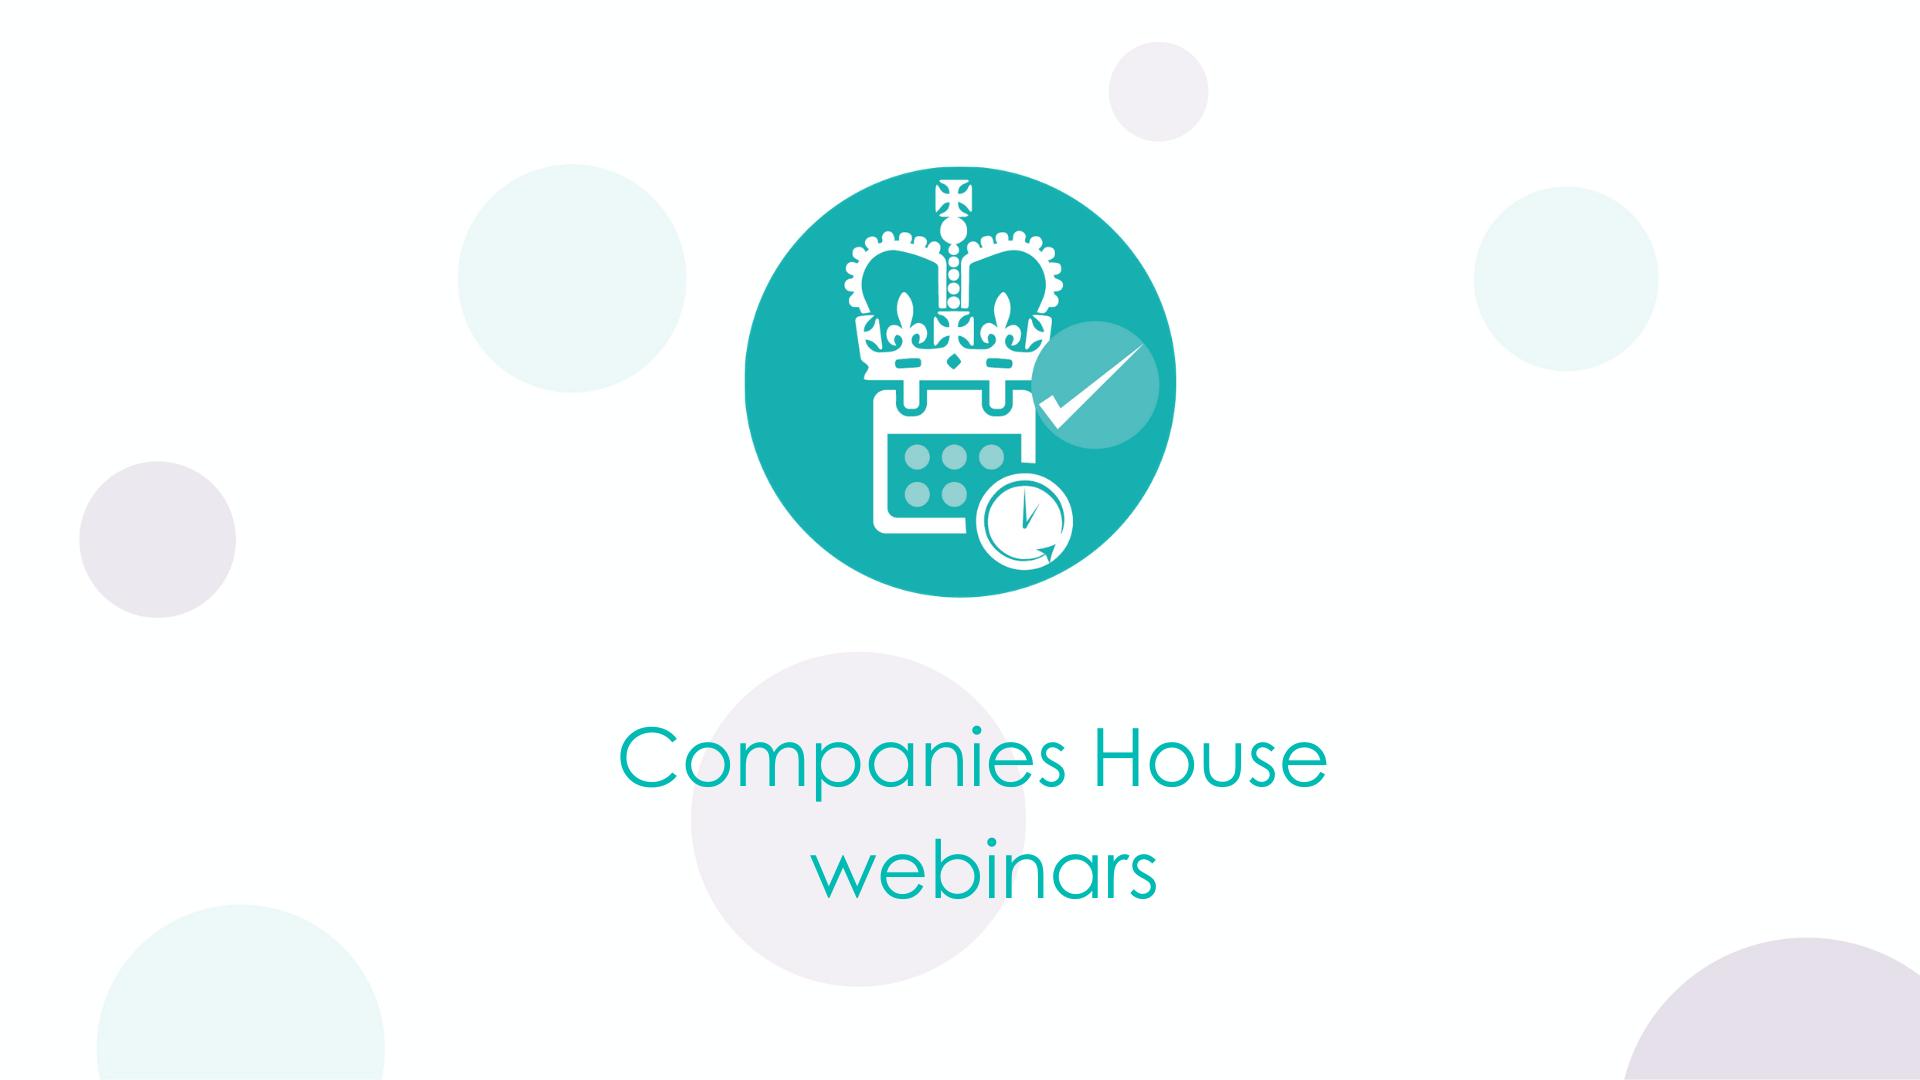 Companies House webinars